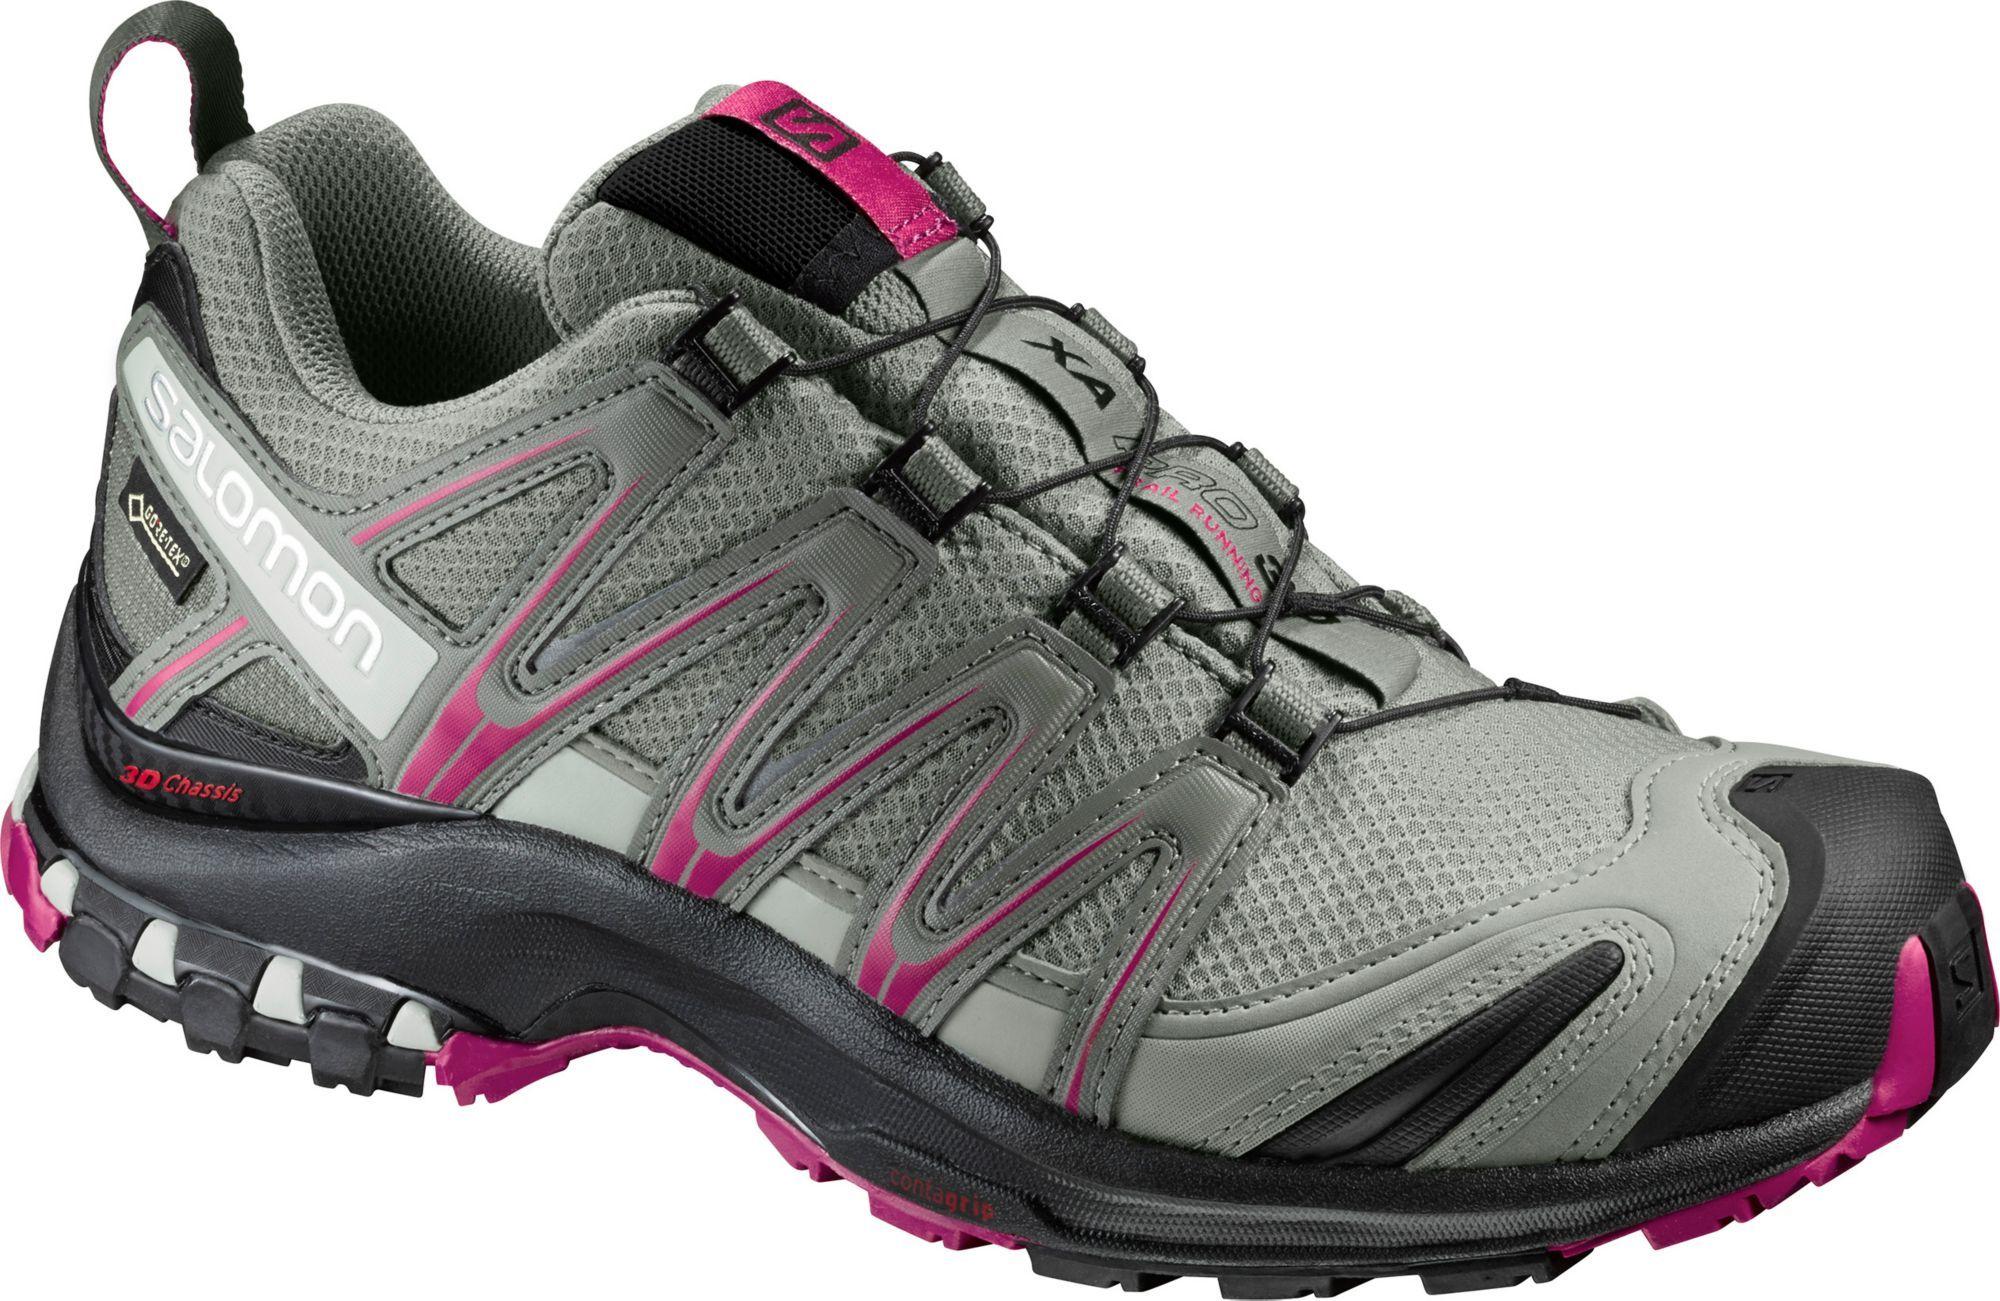 Salomon Women's XA Pro 3D GTX Waterproof Hiking Shoes, Size